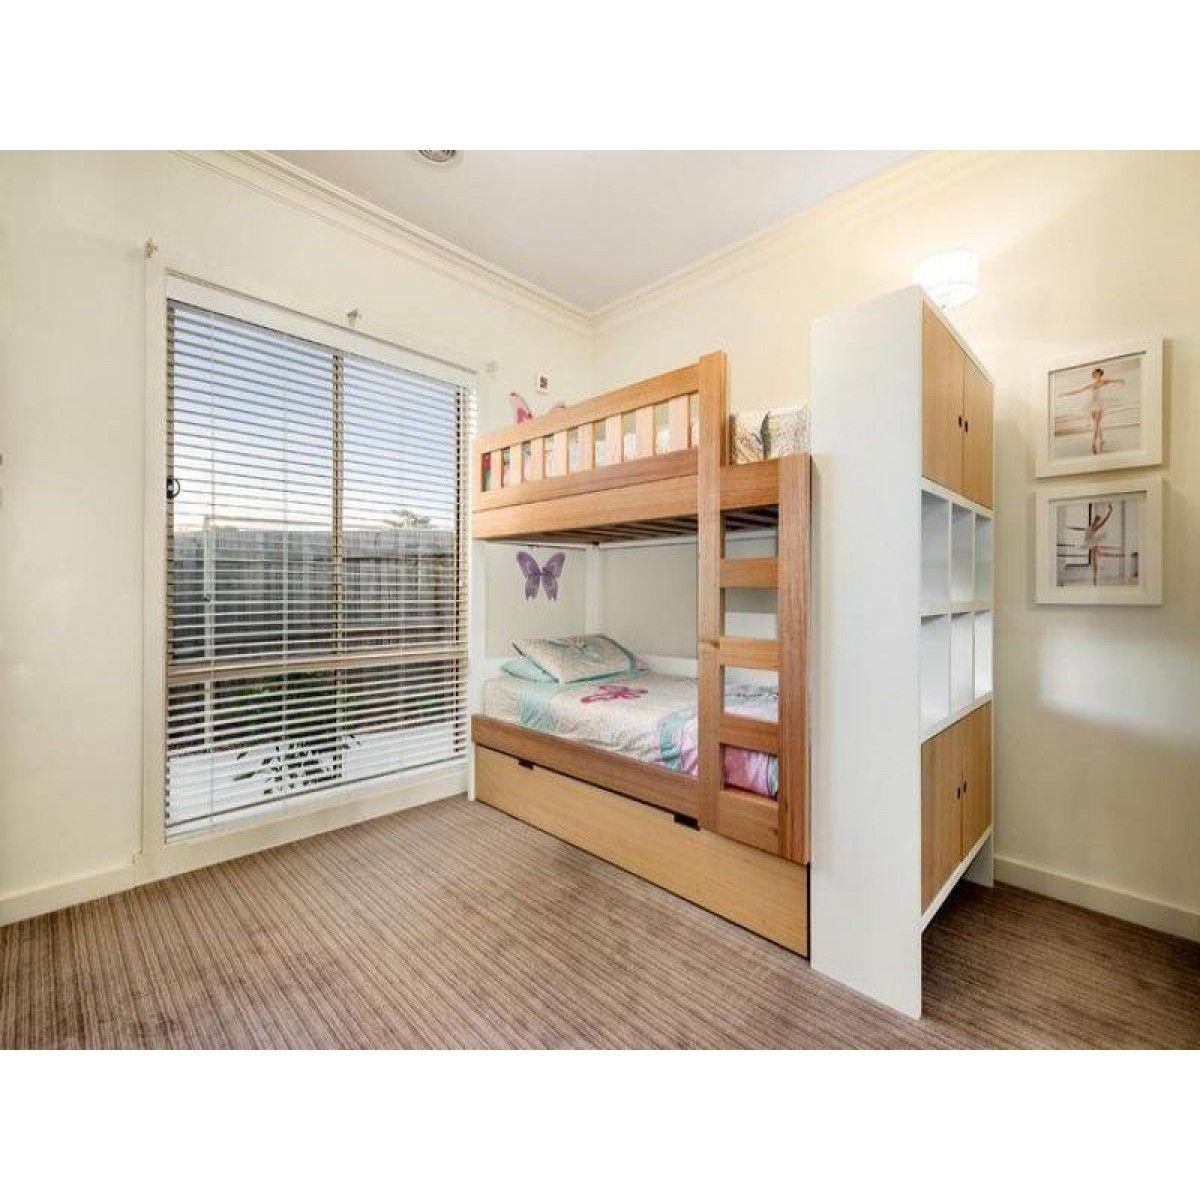 Buy vogue kids bunk bed Online in Australia, Find best